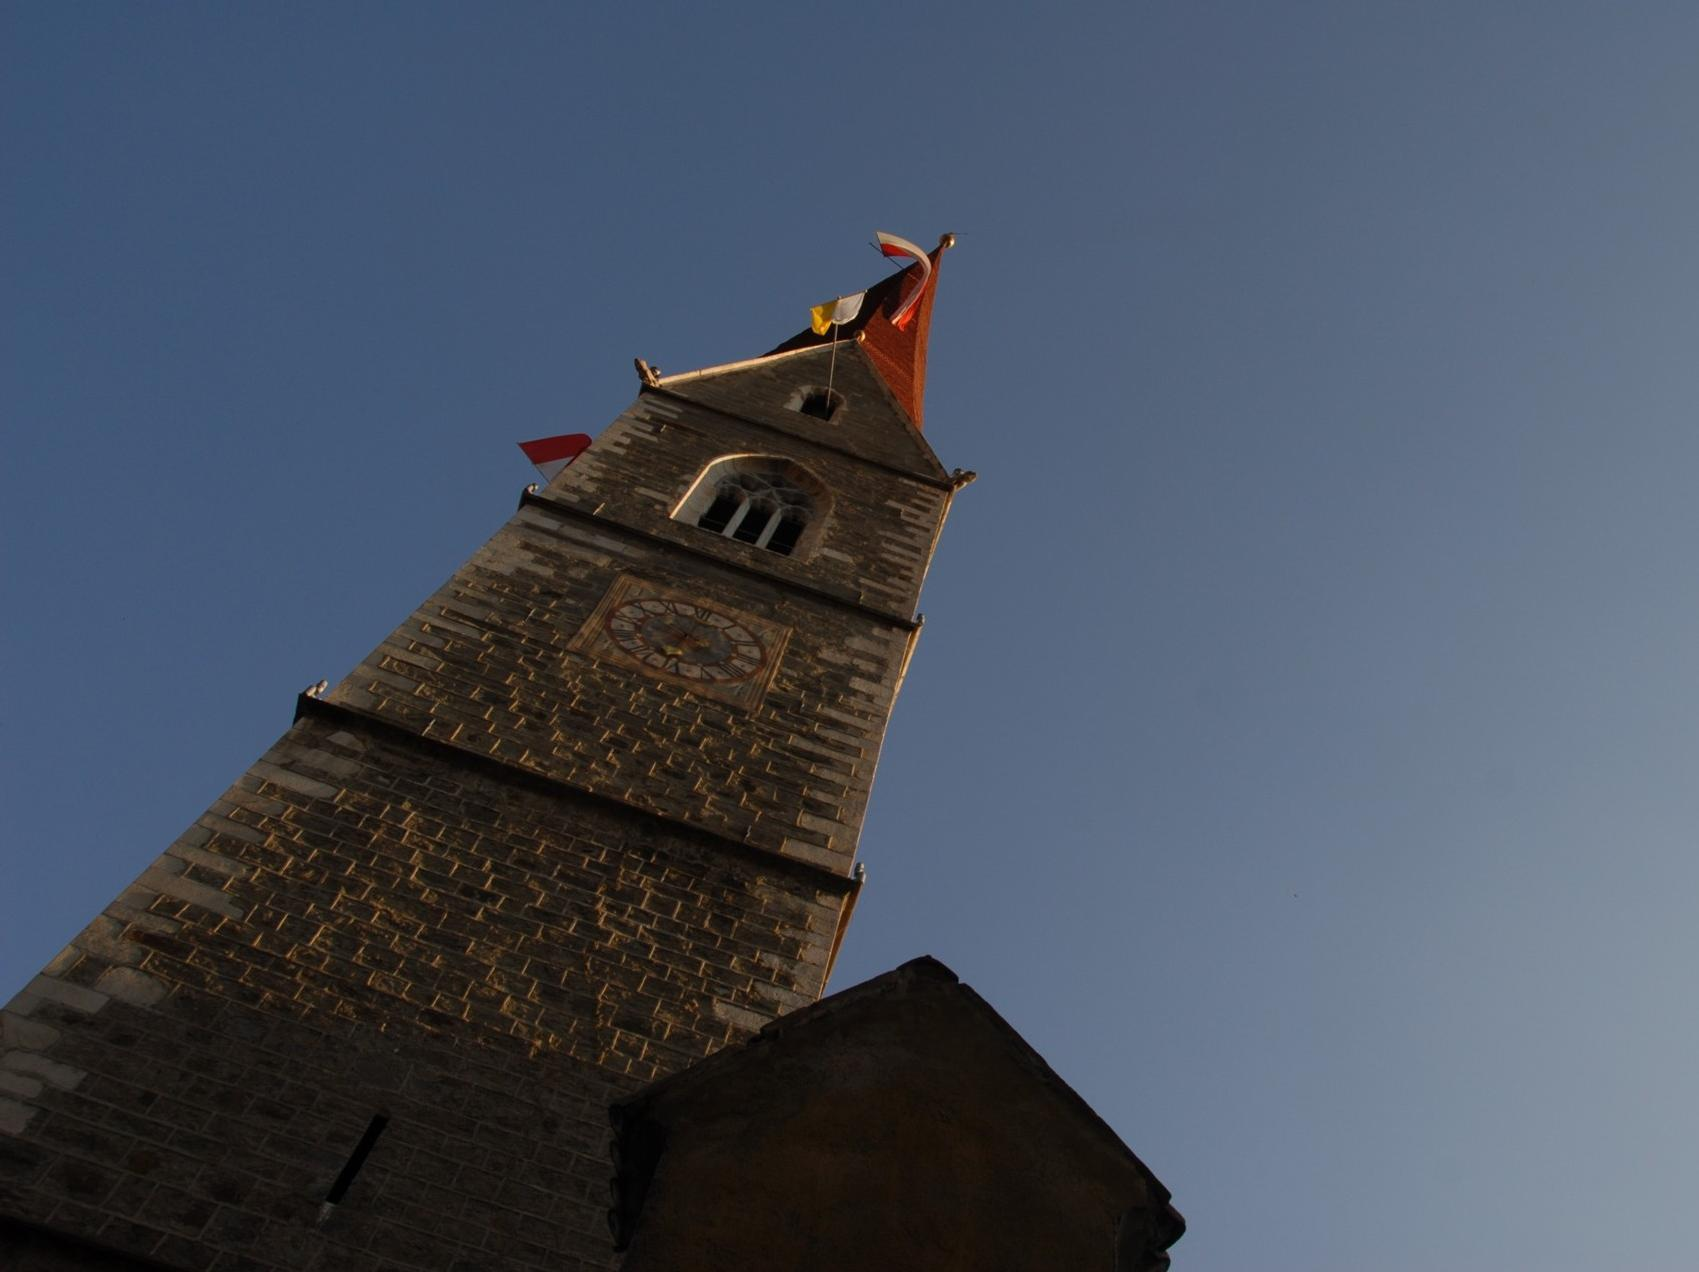 Pfarrkirche Maria Himmelfahrt, Schlanders